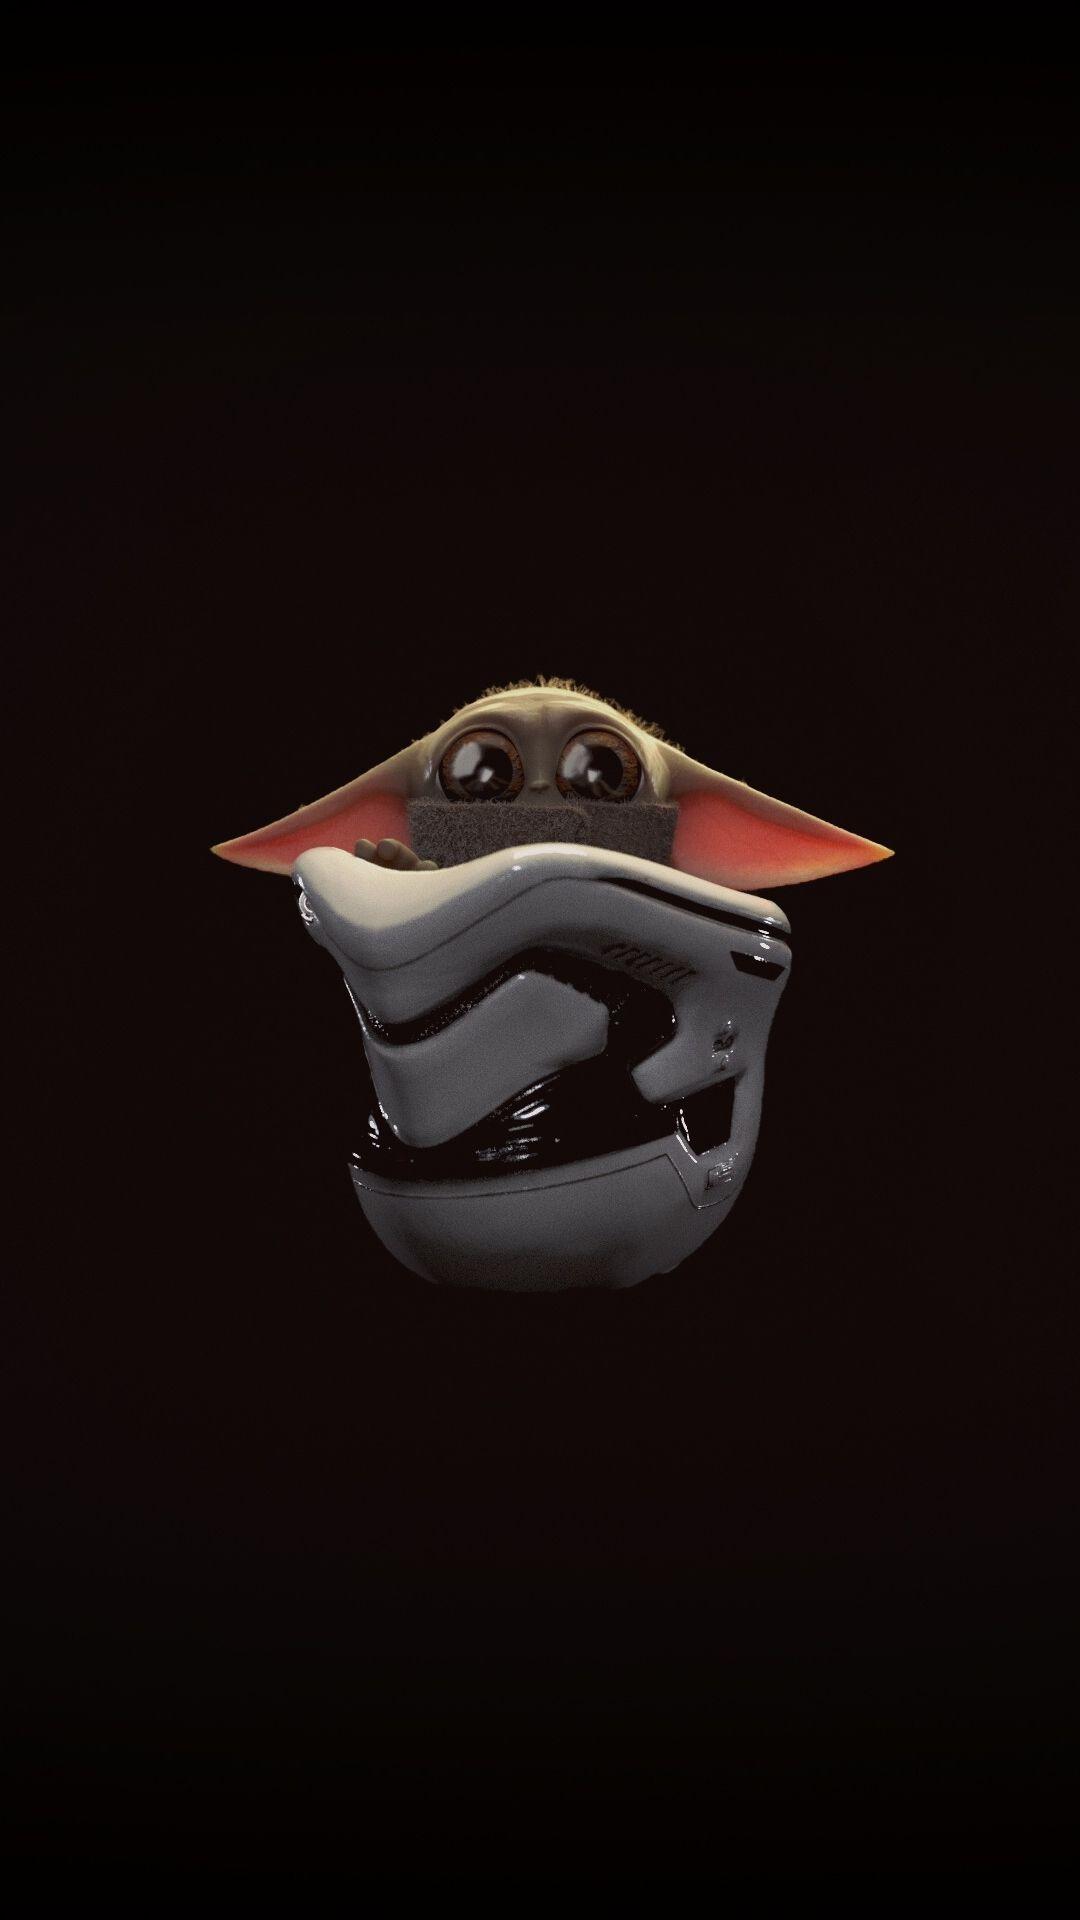 The Mandalorian Baby Yoda Wallpaper in 2020 Cool